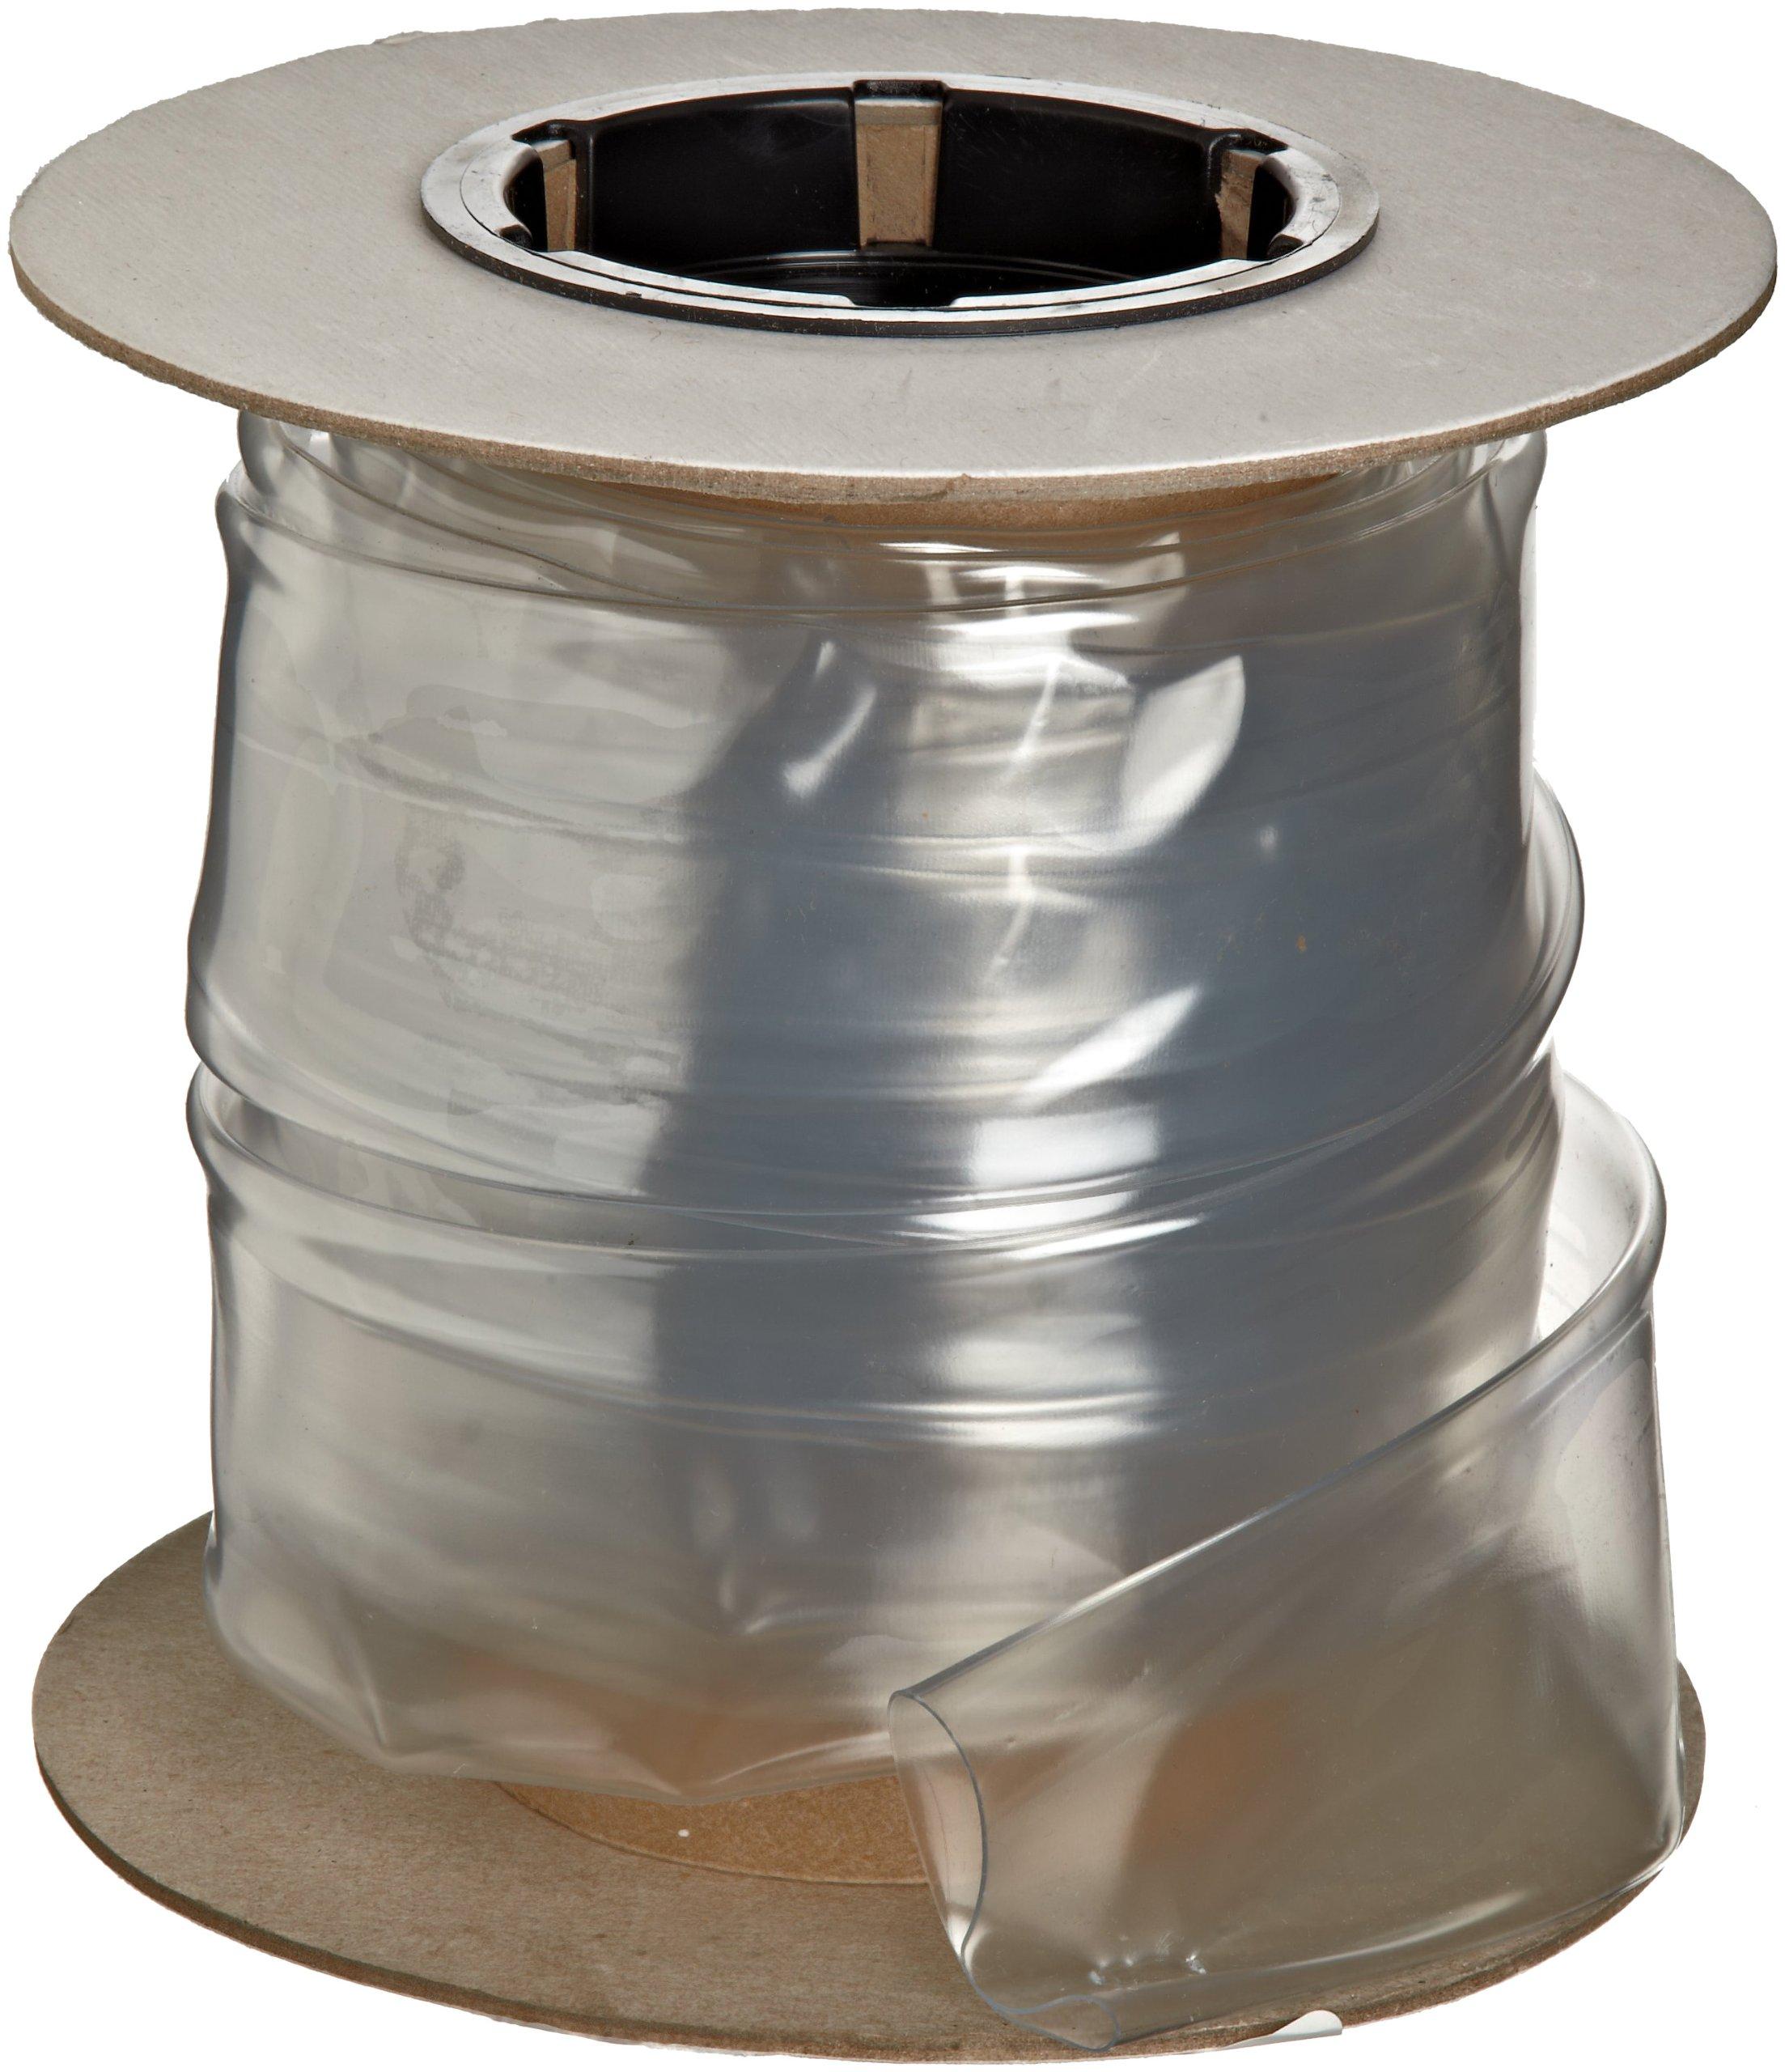 Insultab 3015000C1A5 HS-105 1-1/2'', 25' Clear Polyvinylchloride Heat Shrink Tubing